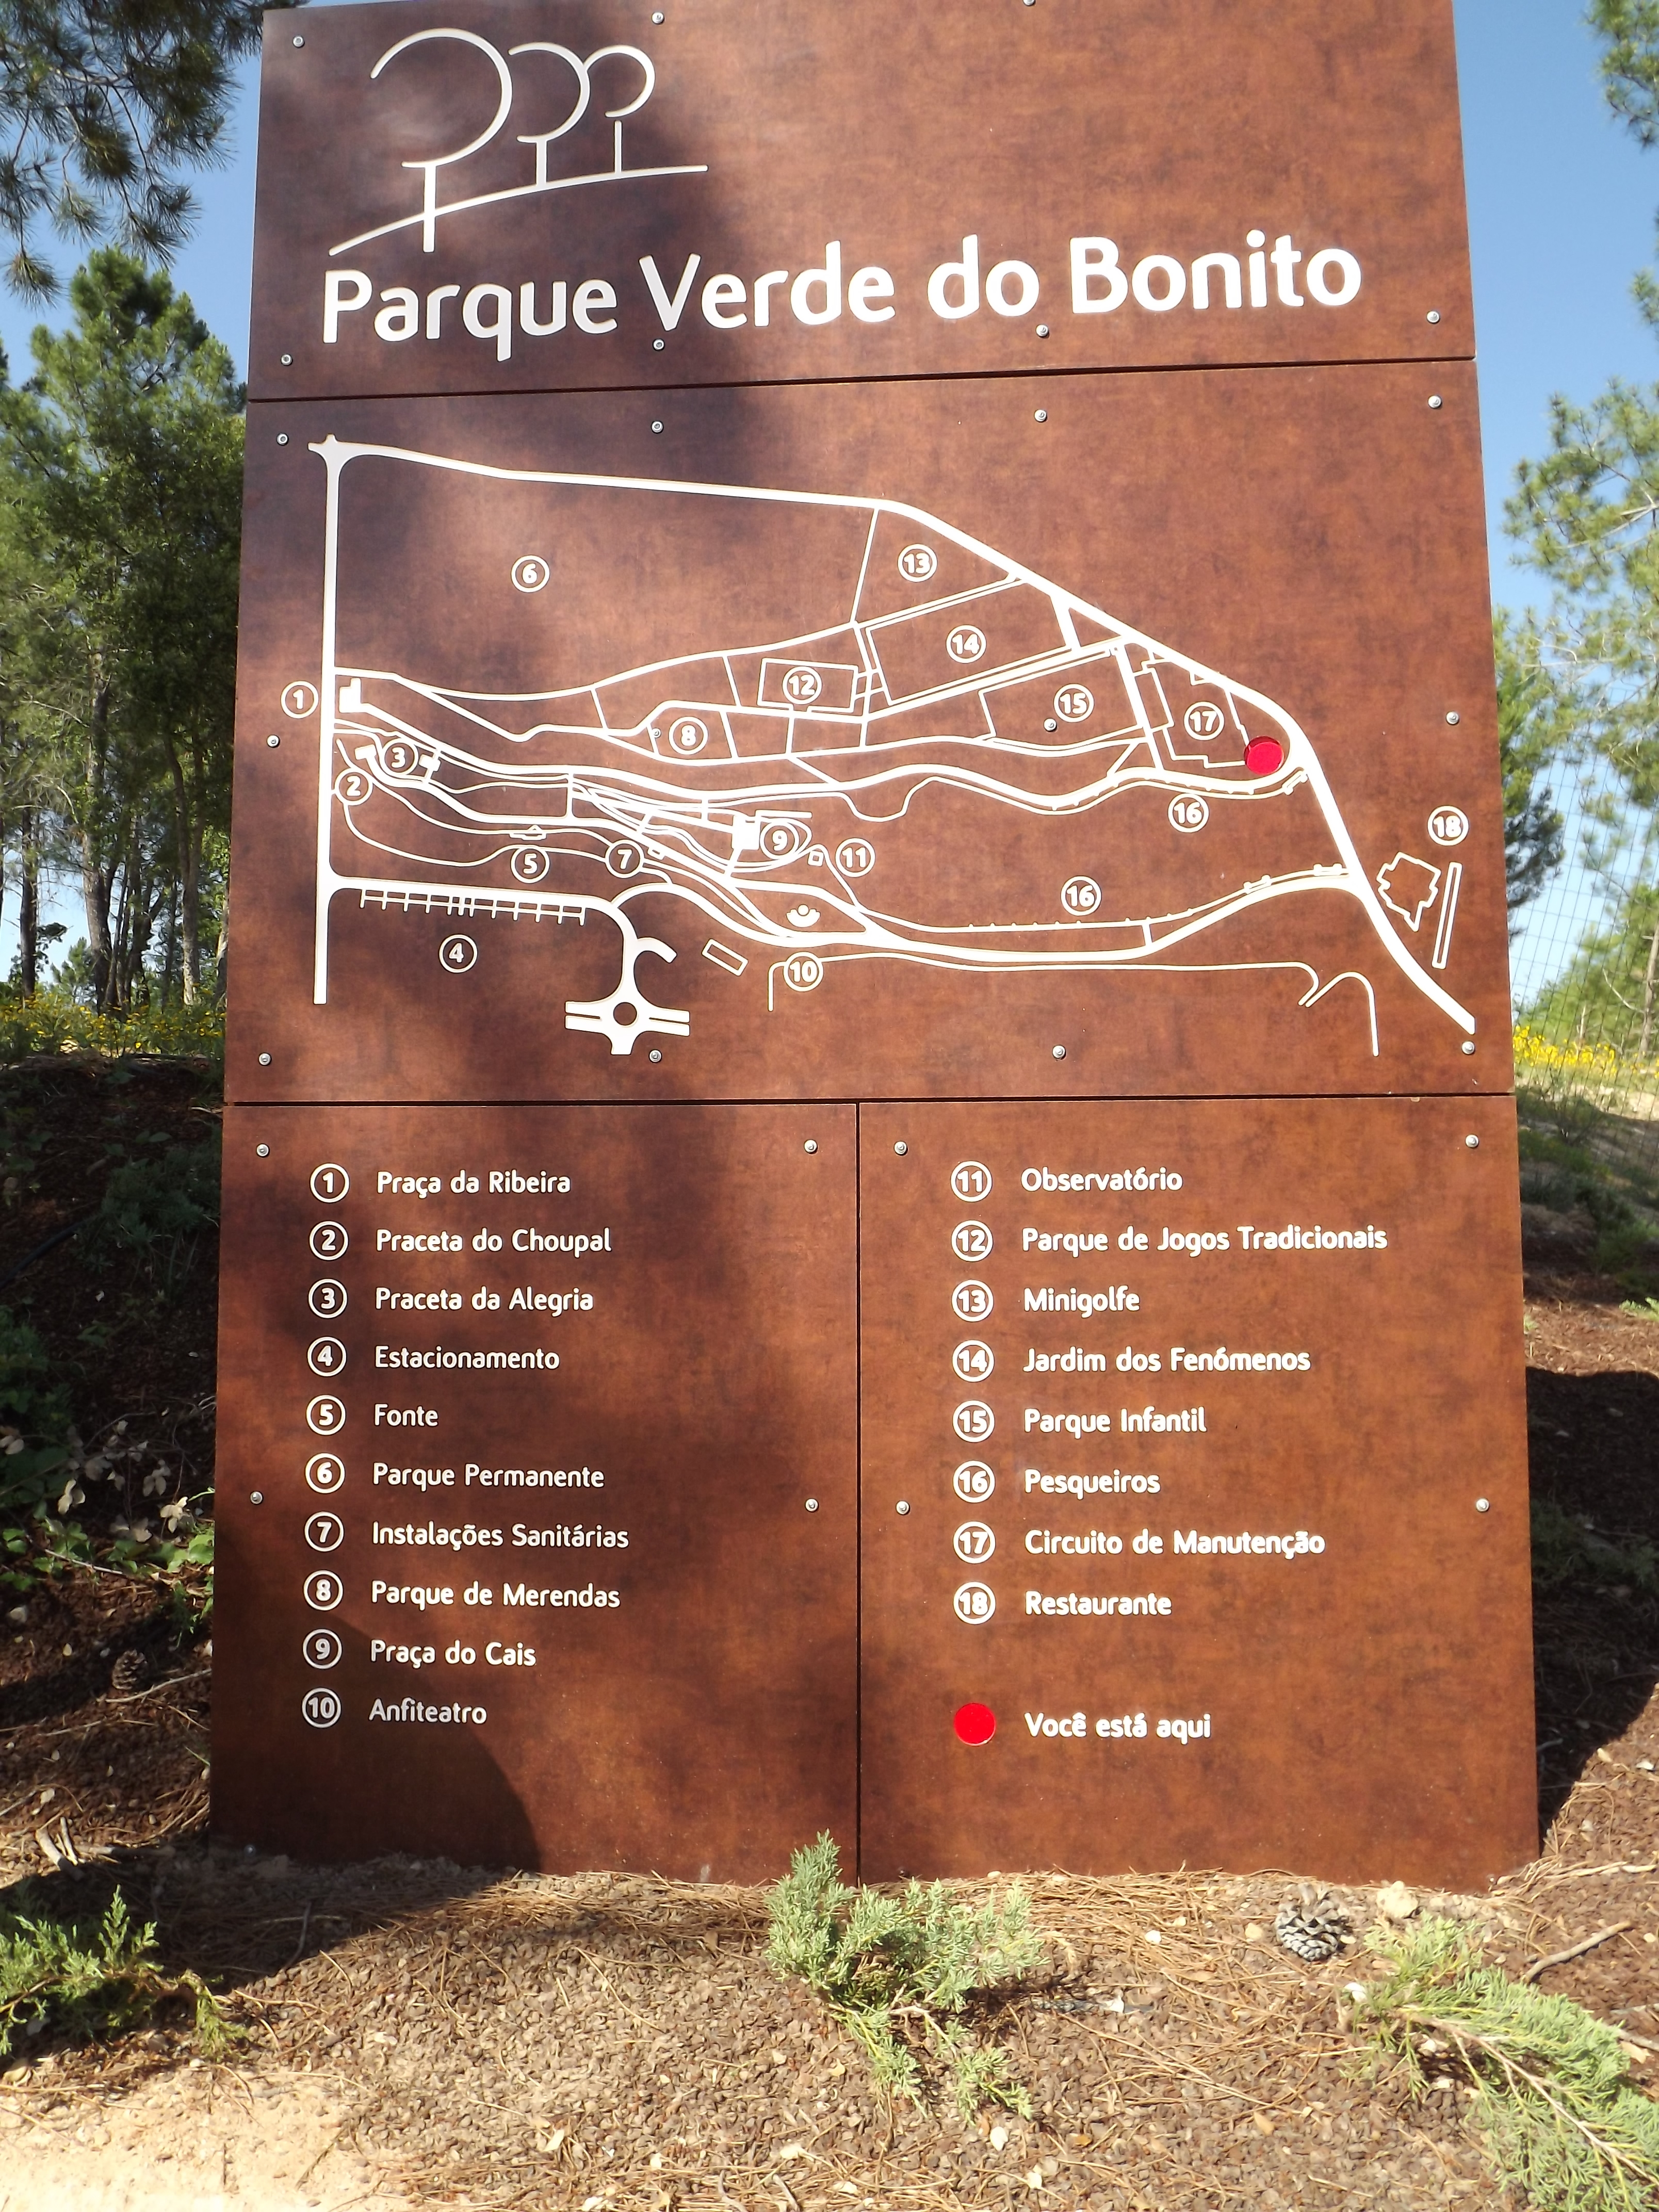 Parque Verde Do Bonito Wikipedia A Enciclopedia Livre